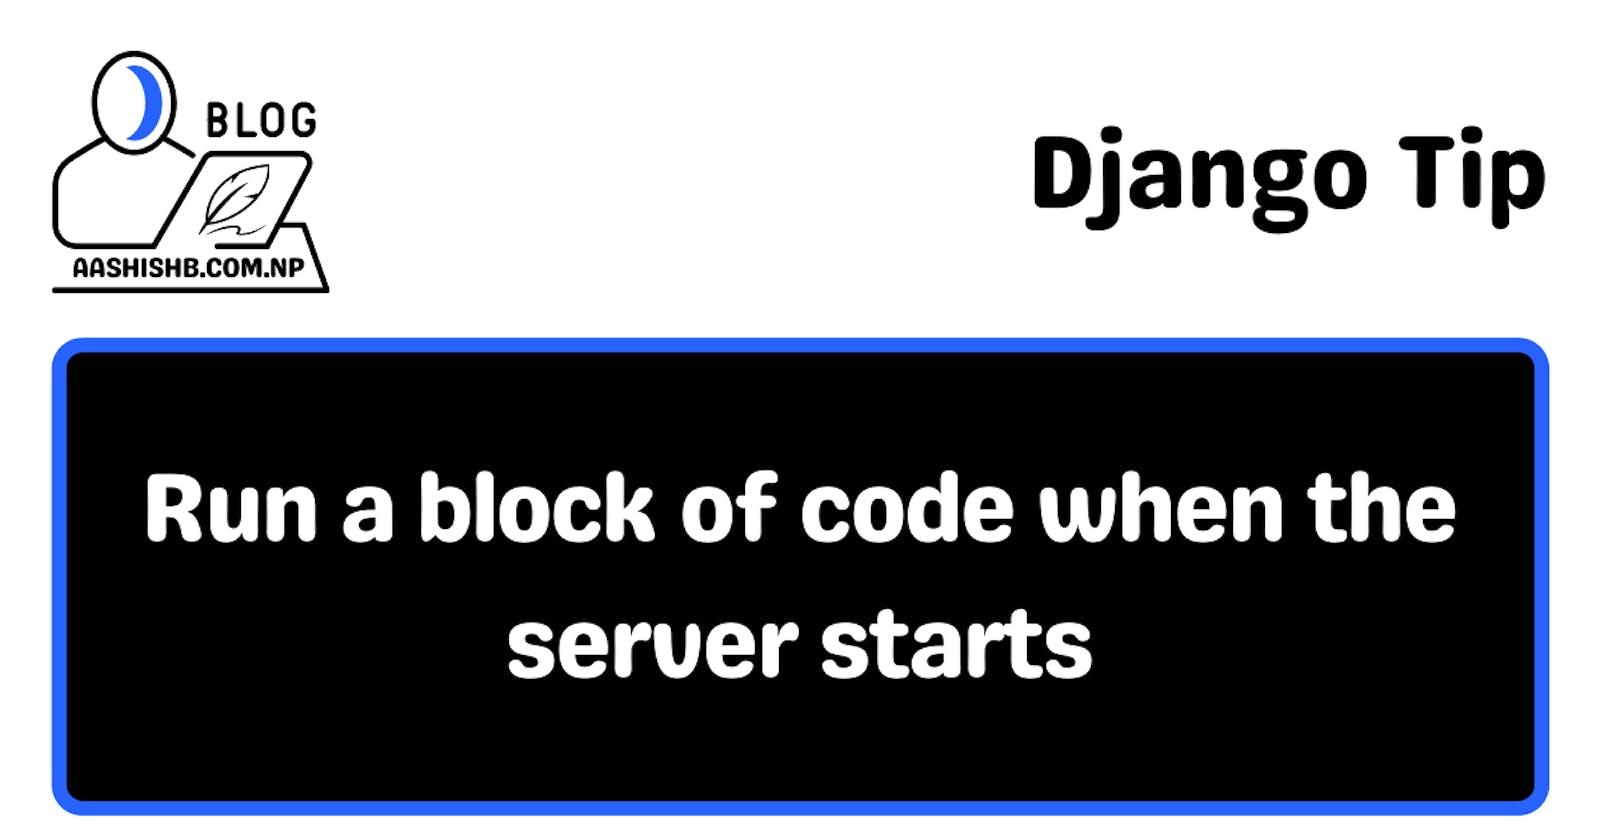 Django Tip | Run a block of code when the server starts.